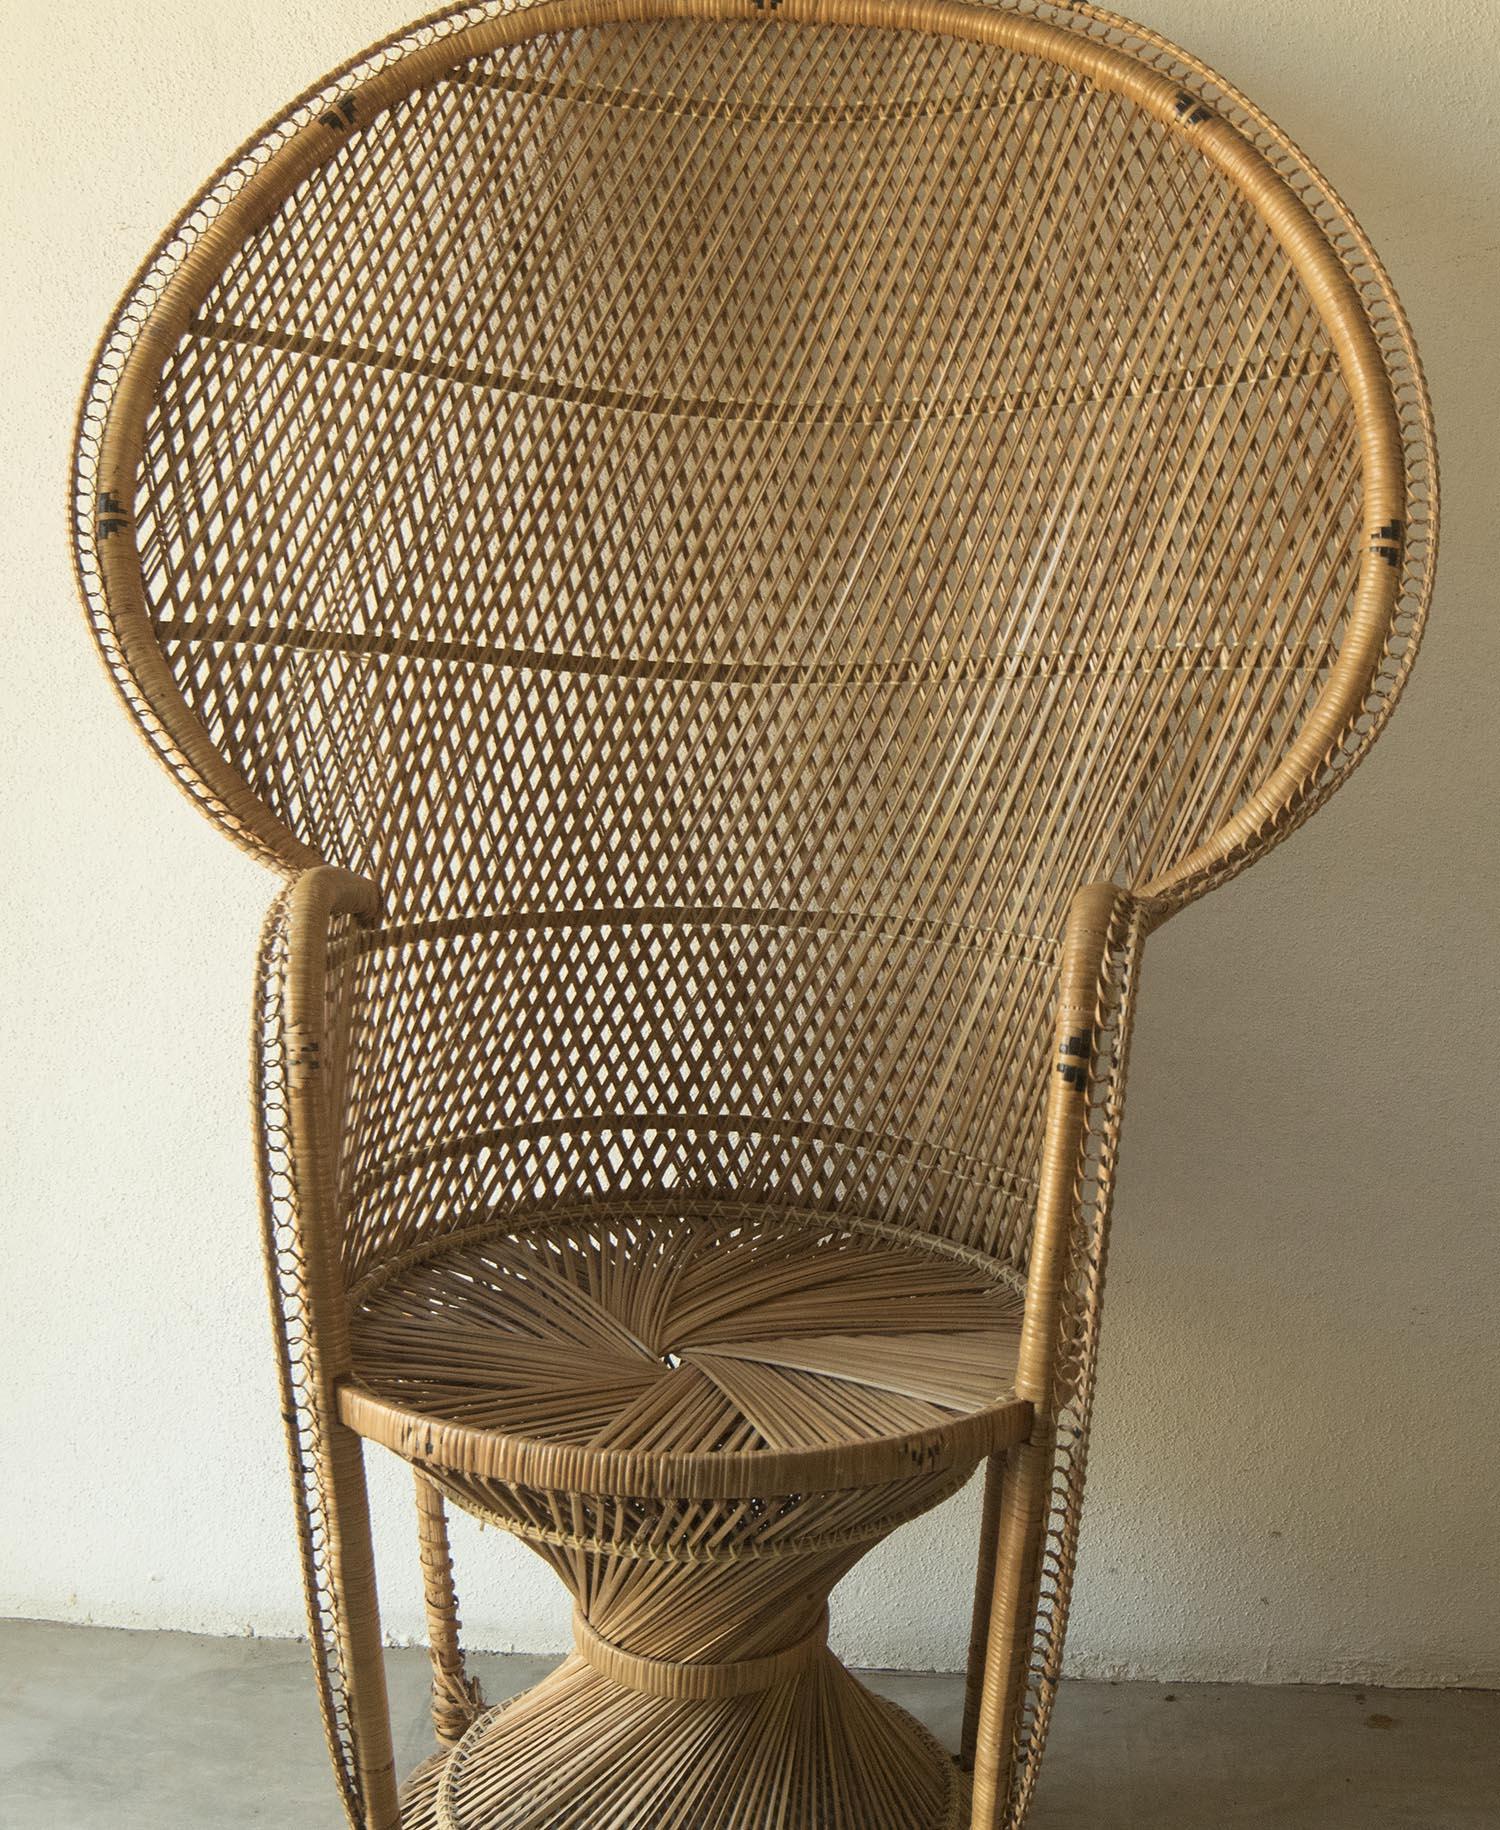 rattan peacock chair mayfair dining chairs set of 2 nicoella jpg